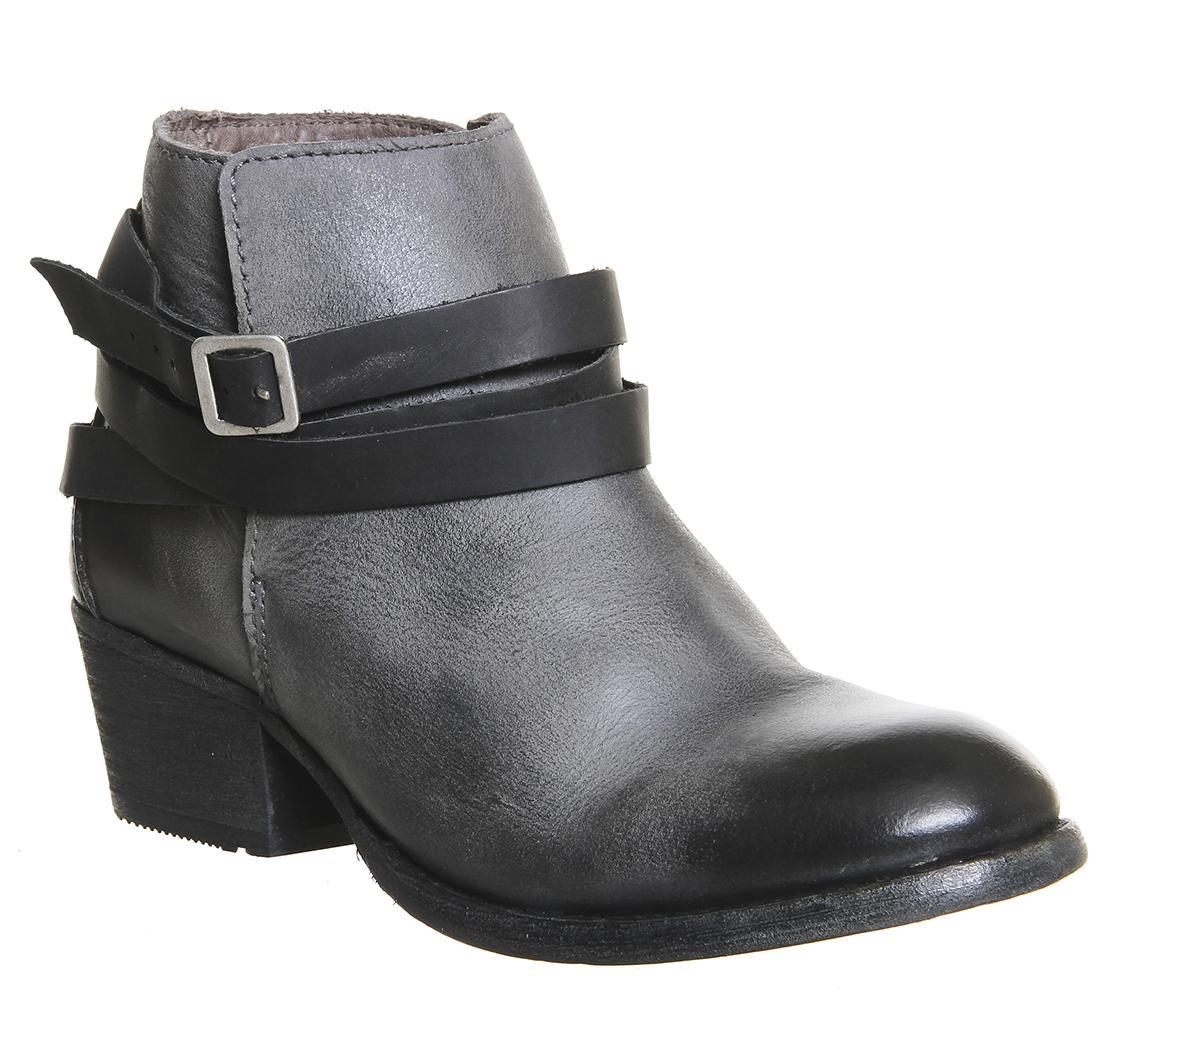 Horrigan Strap Ankle Boots